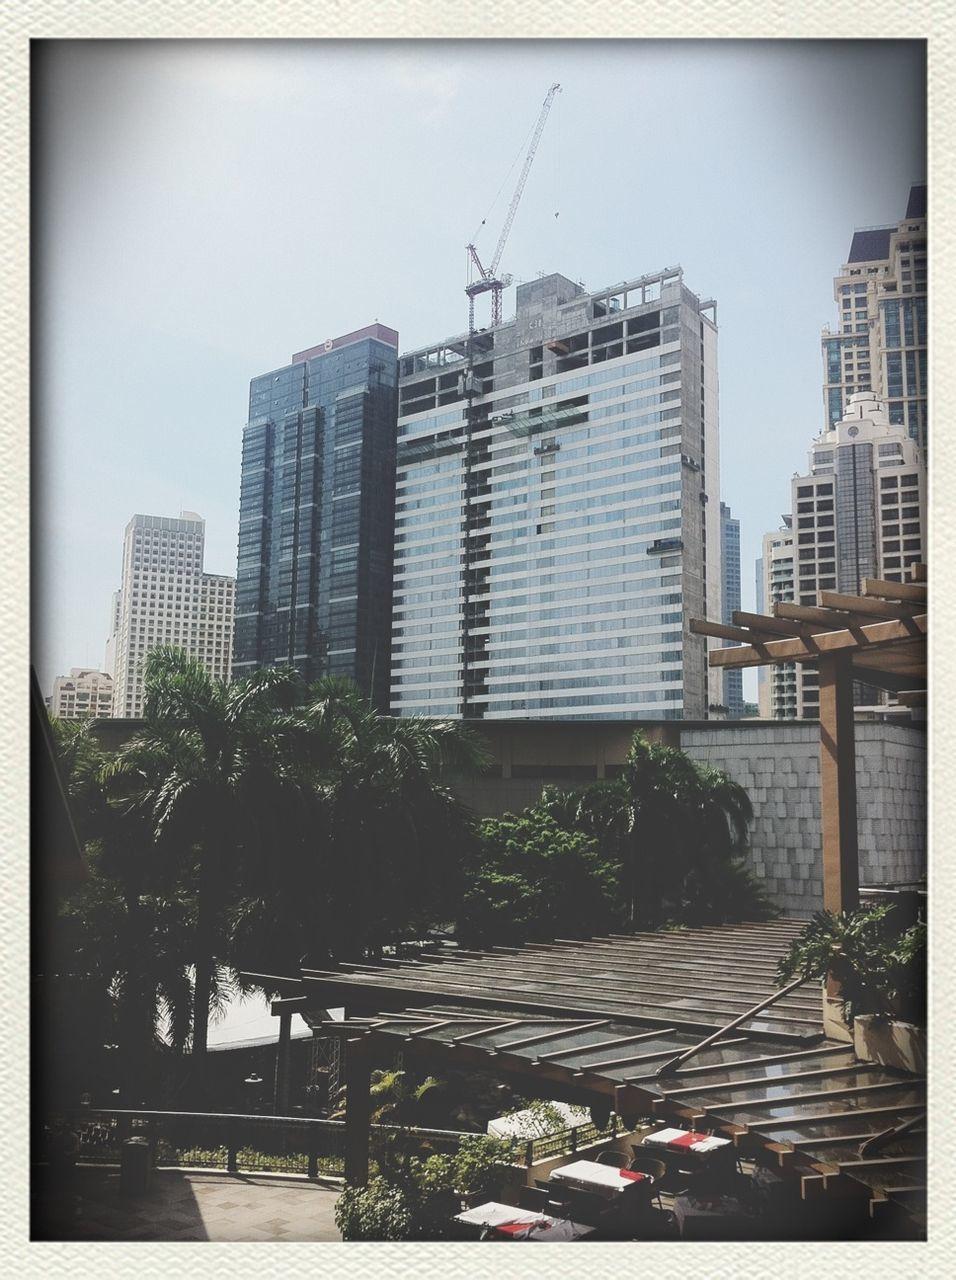 Office Block Construction Site